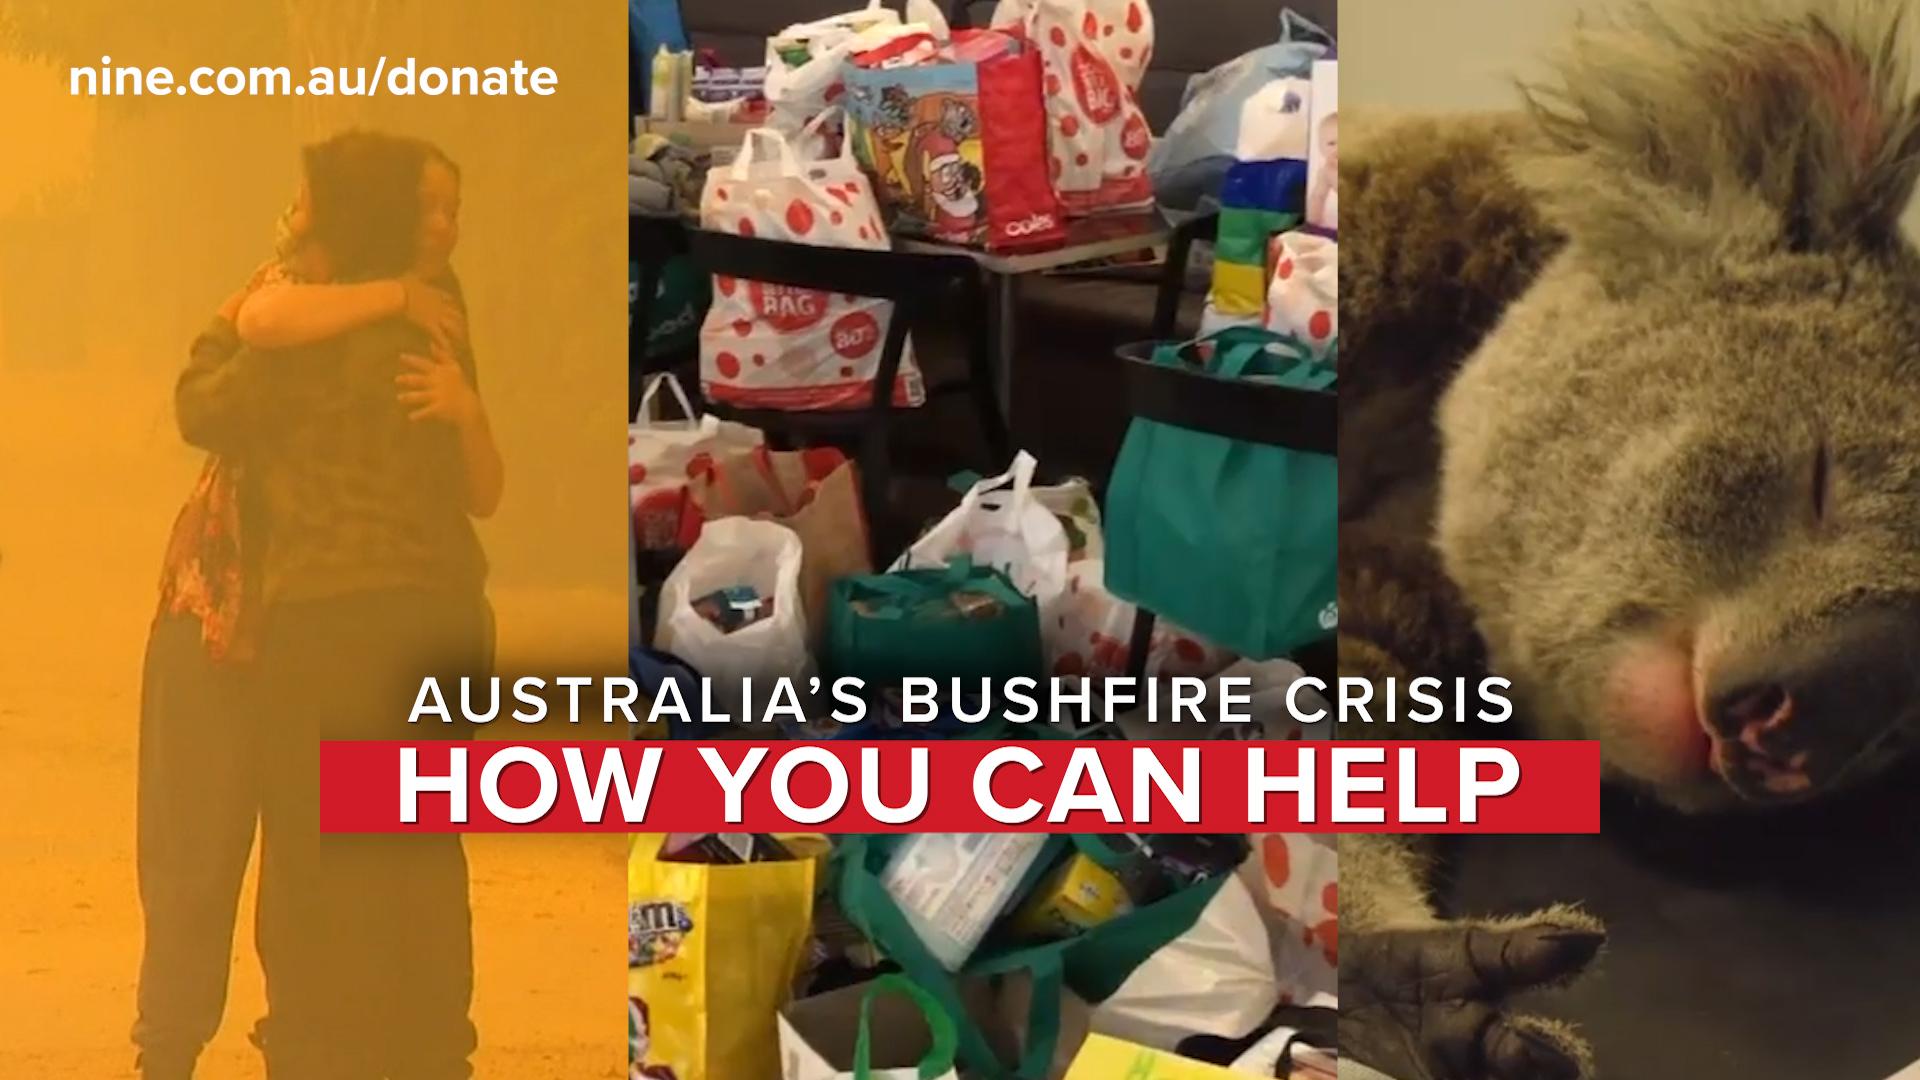 Australian bushfires: How you can help